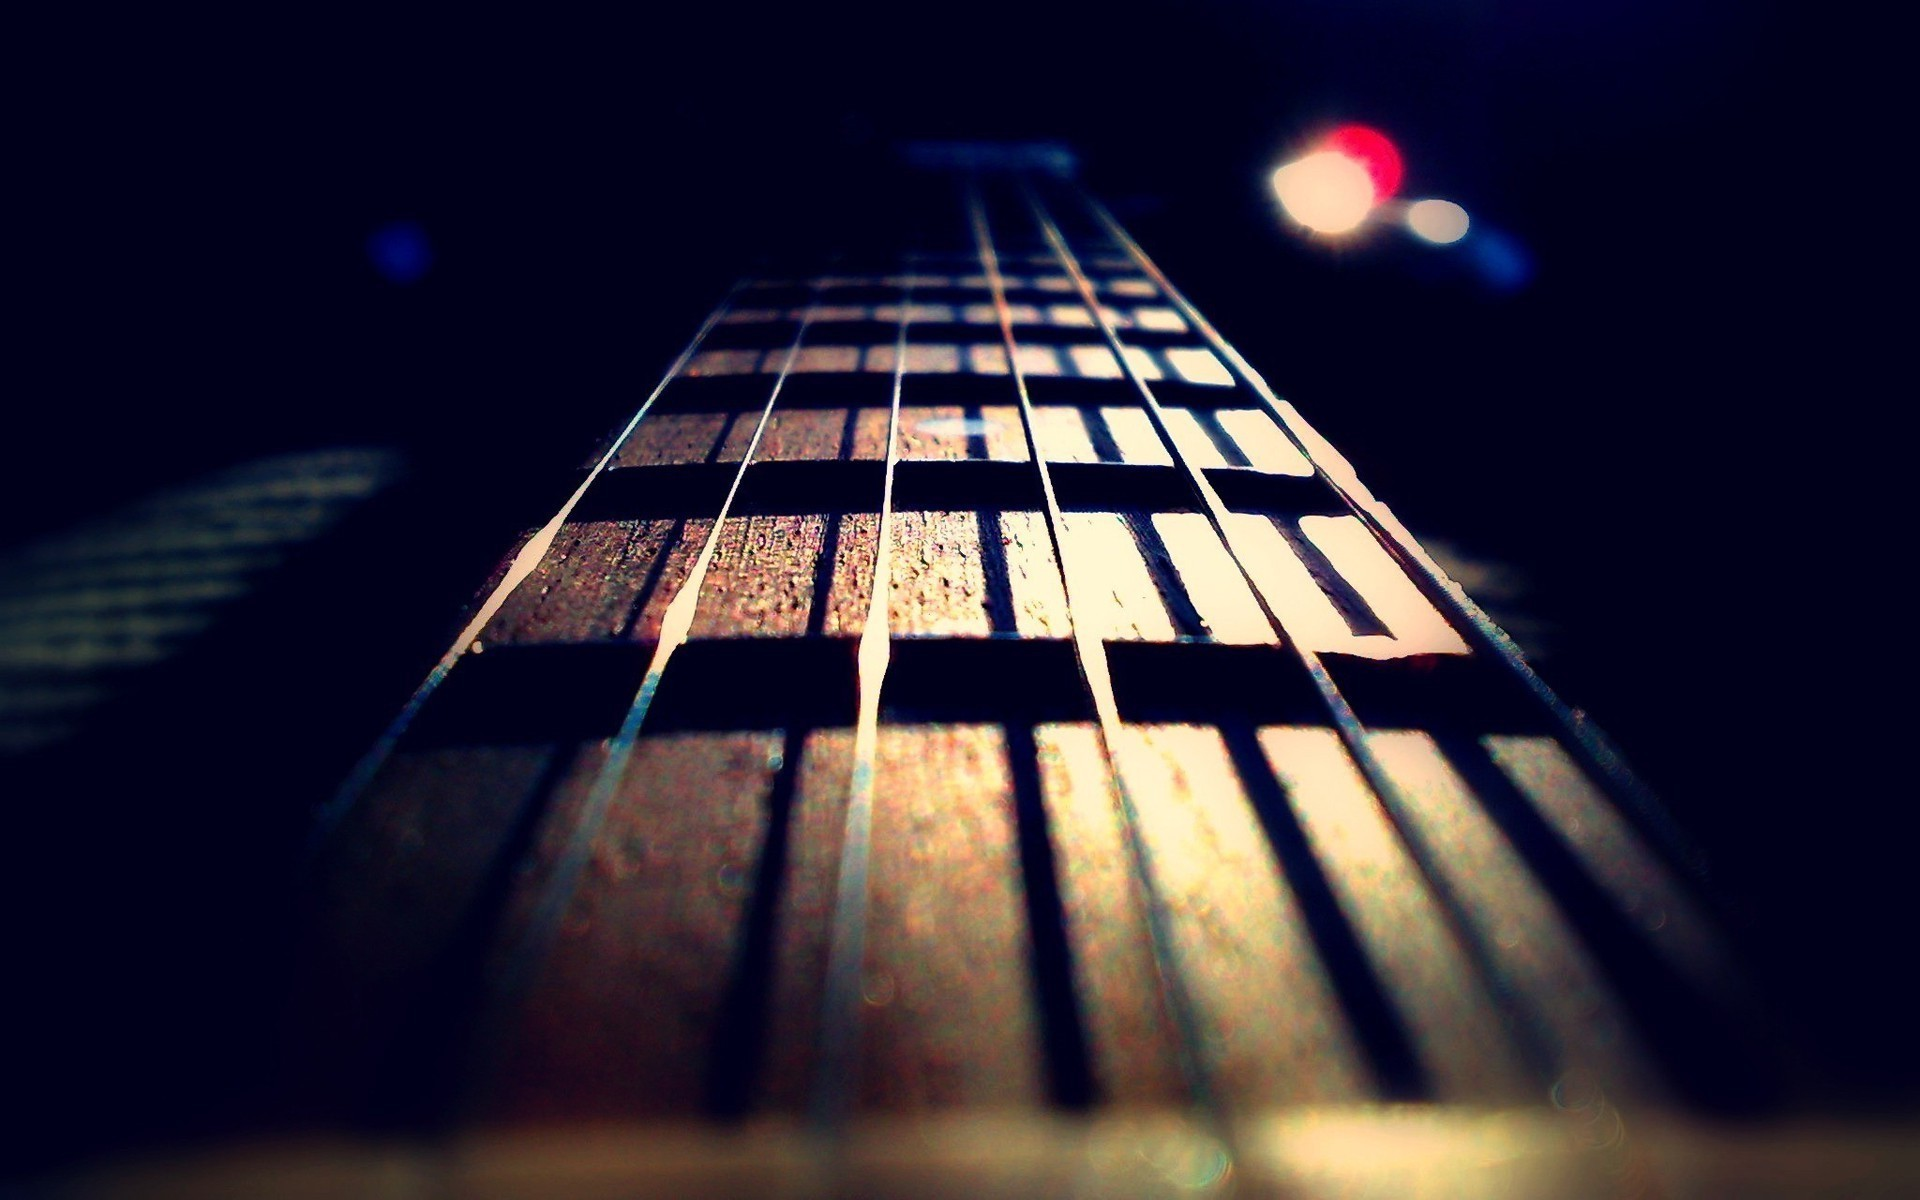 Acoustic Guitar Wallpapers 1080p